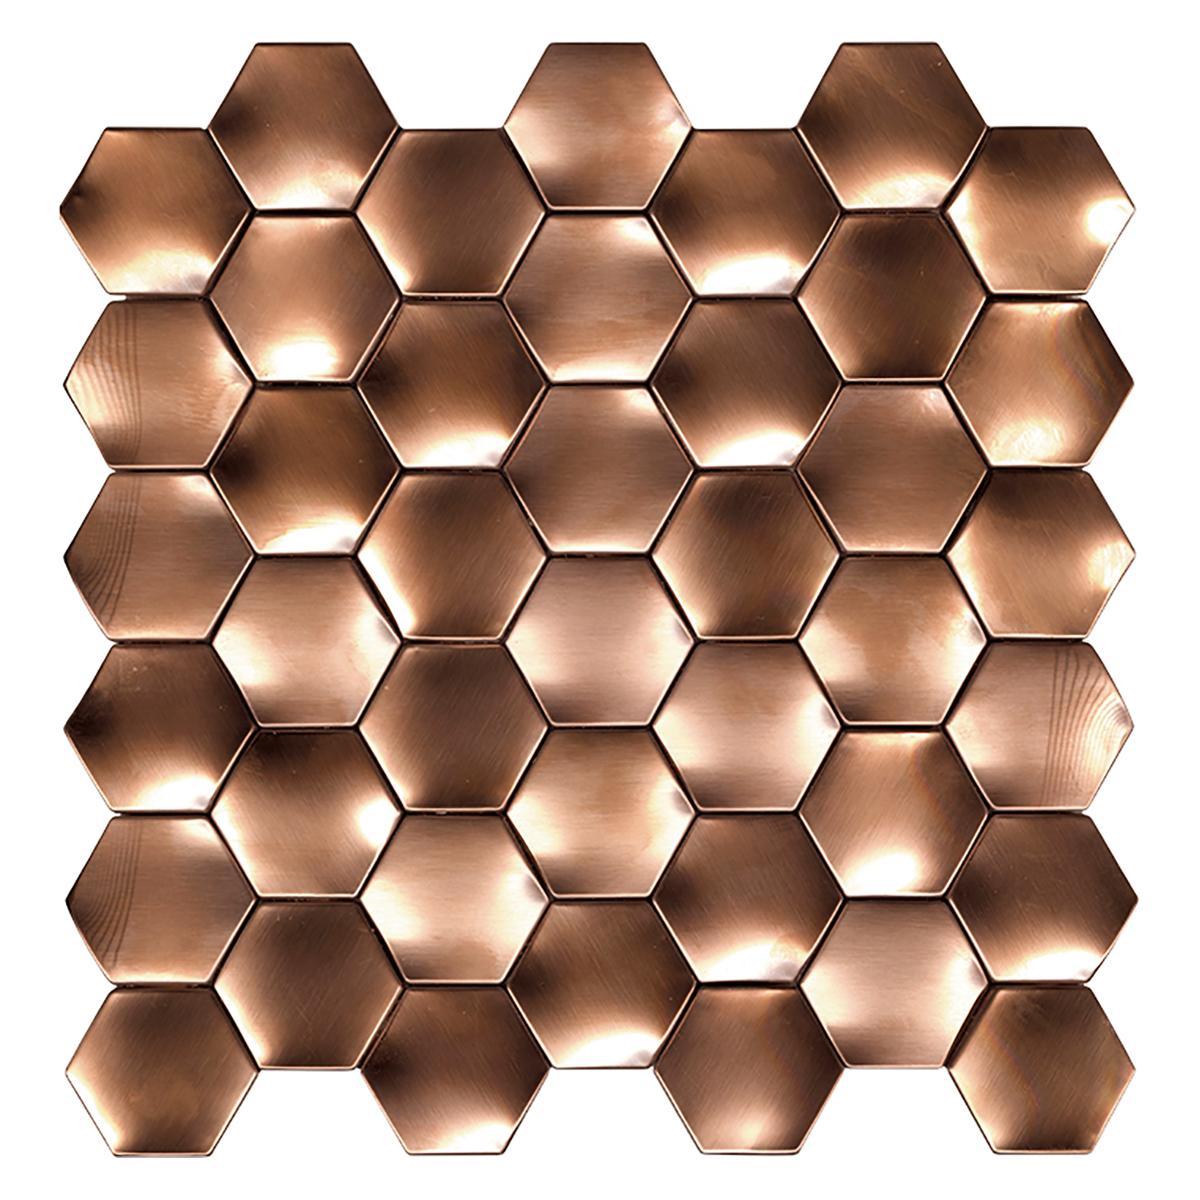 Mosaico Web Bronce Brillante - 29.1X29.3 cm - 1 pza